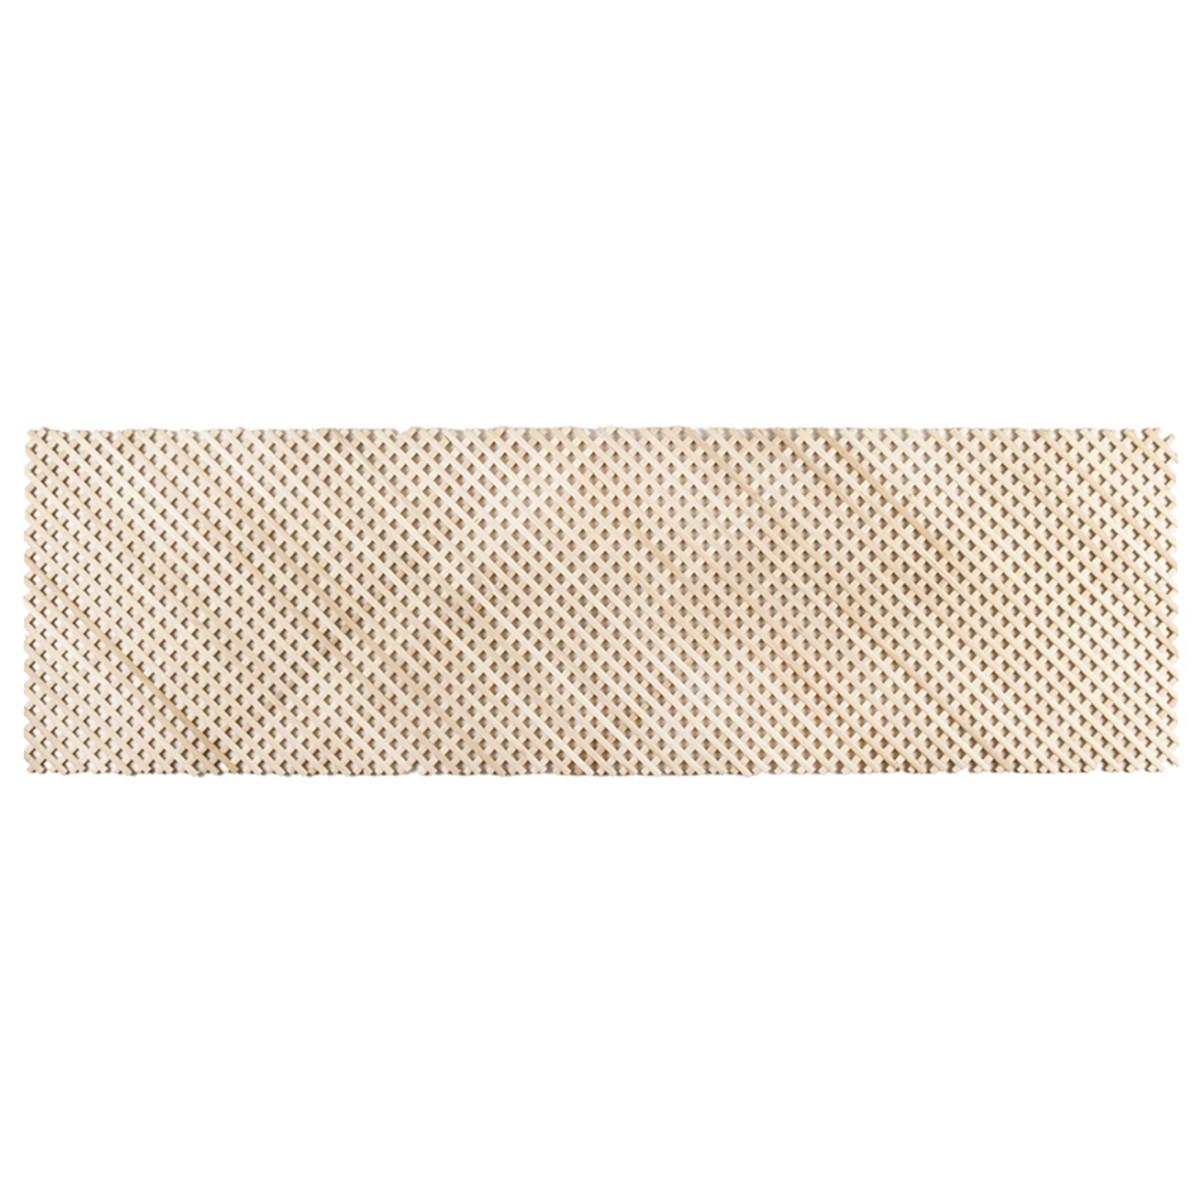 Решетка декоративная 60x200 см